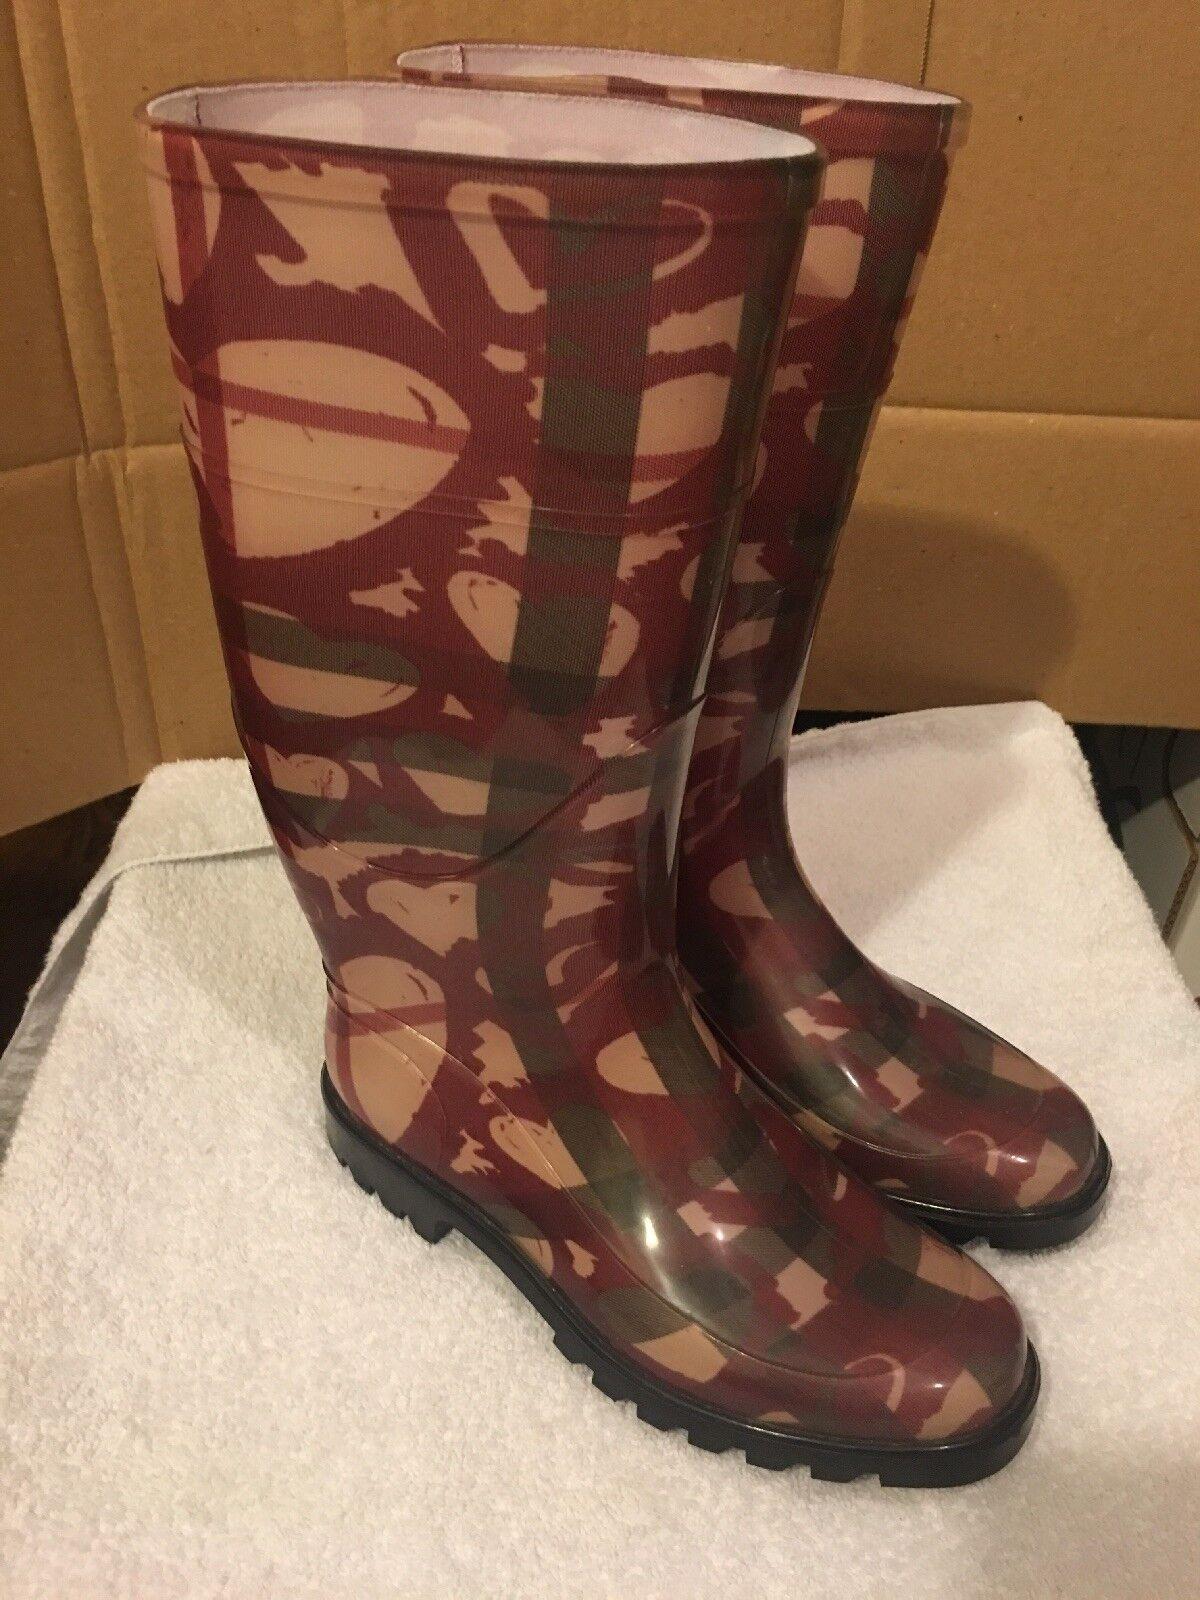 Burberry Womens Mid Calf Rain Boots Rubber Plaid Burgundy- Pink Size 6.5–7